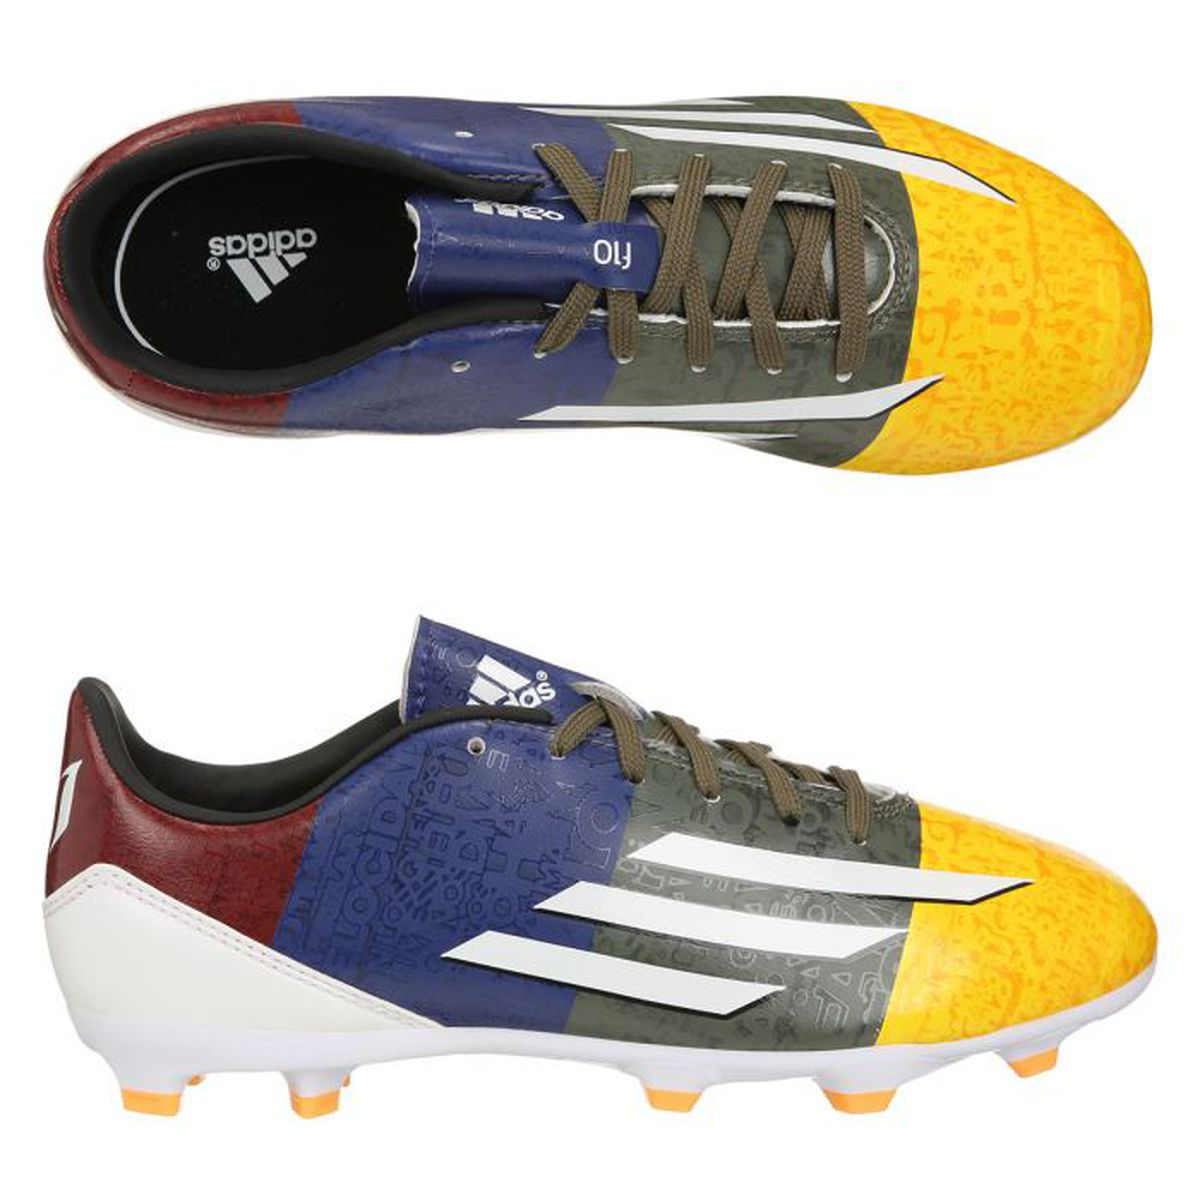 F10 Garçon Pas Football Messi Chaussures Adidas Prix Fg Cher cJTFl13K